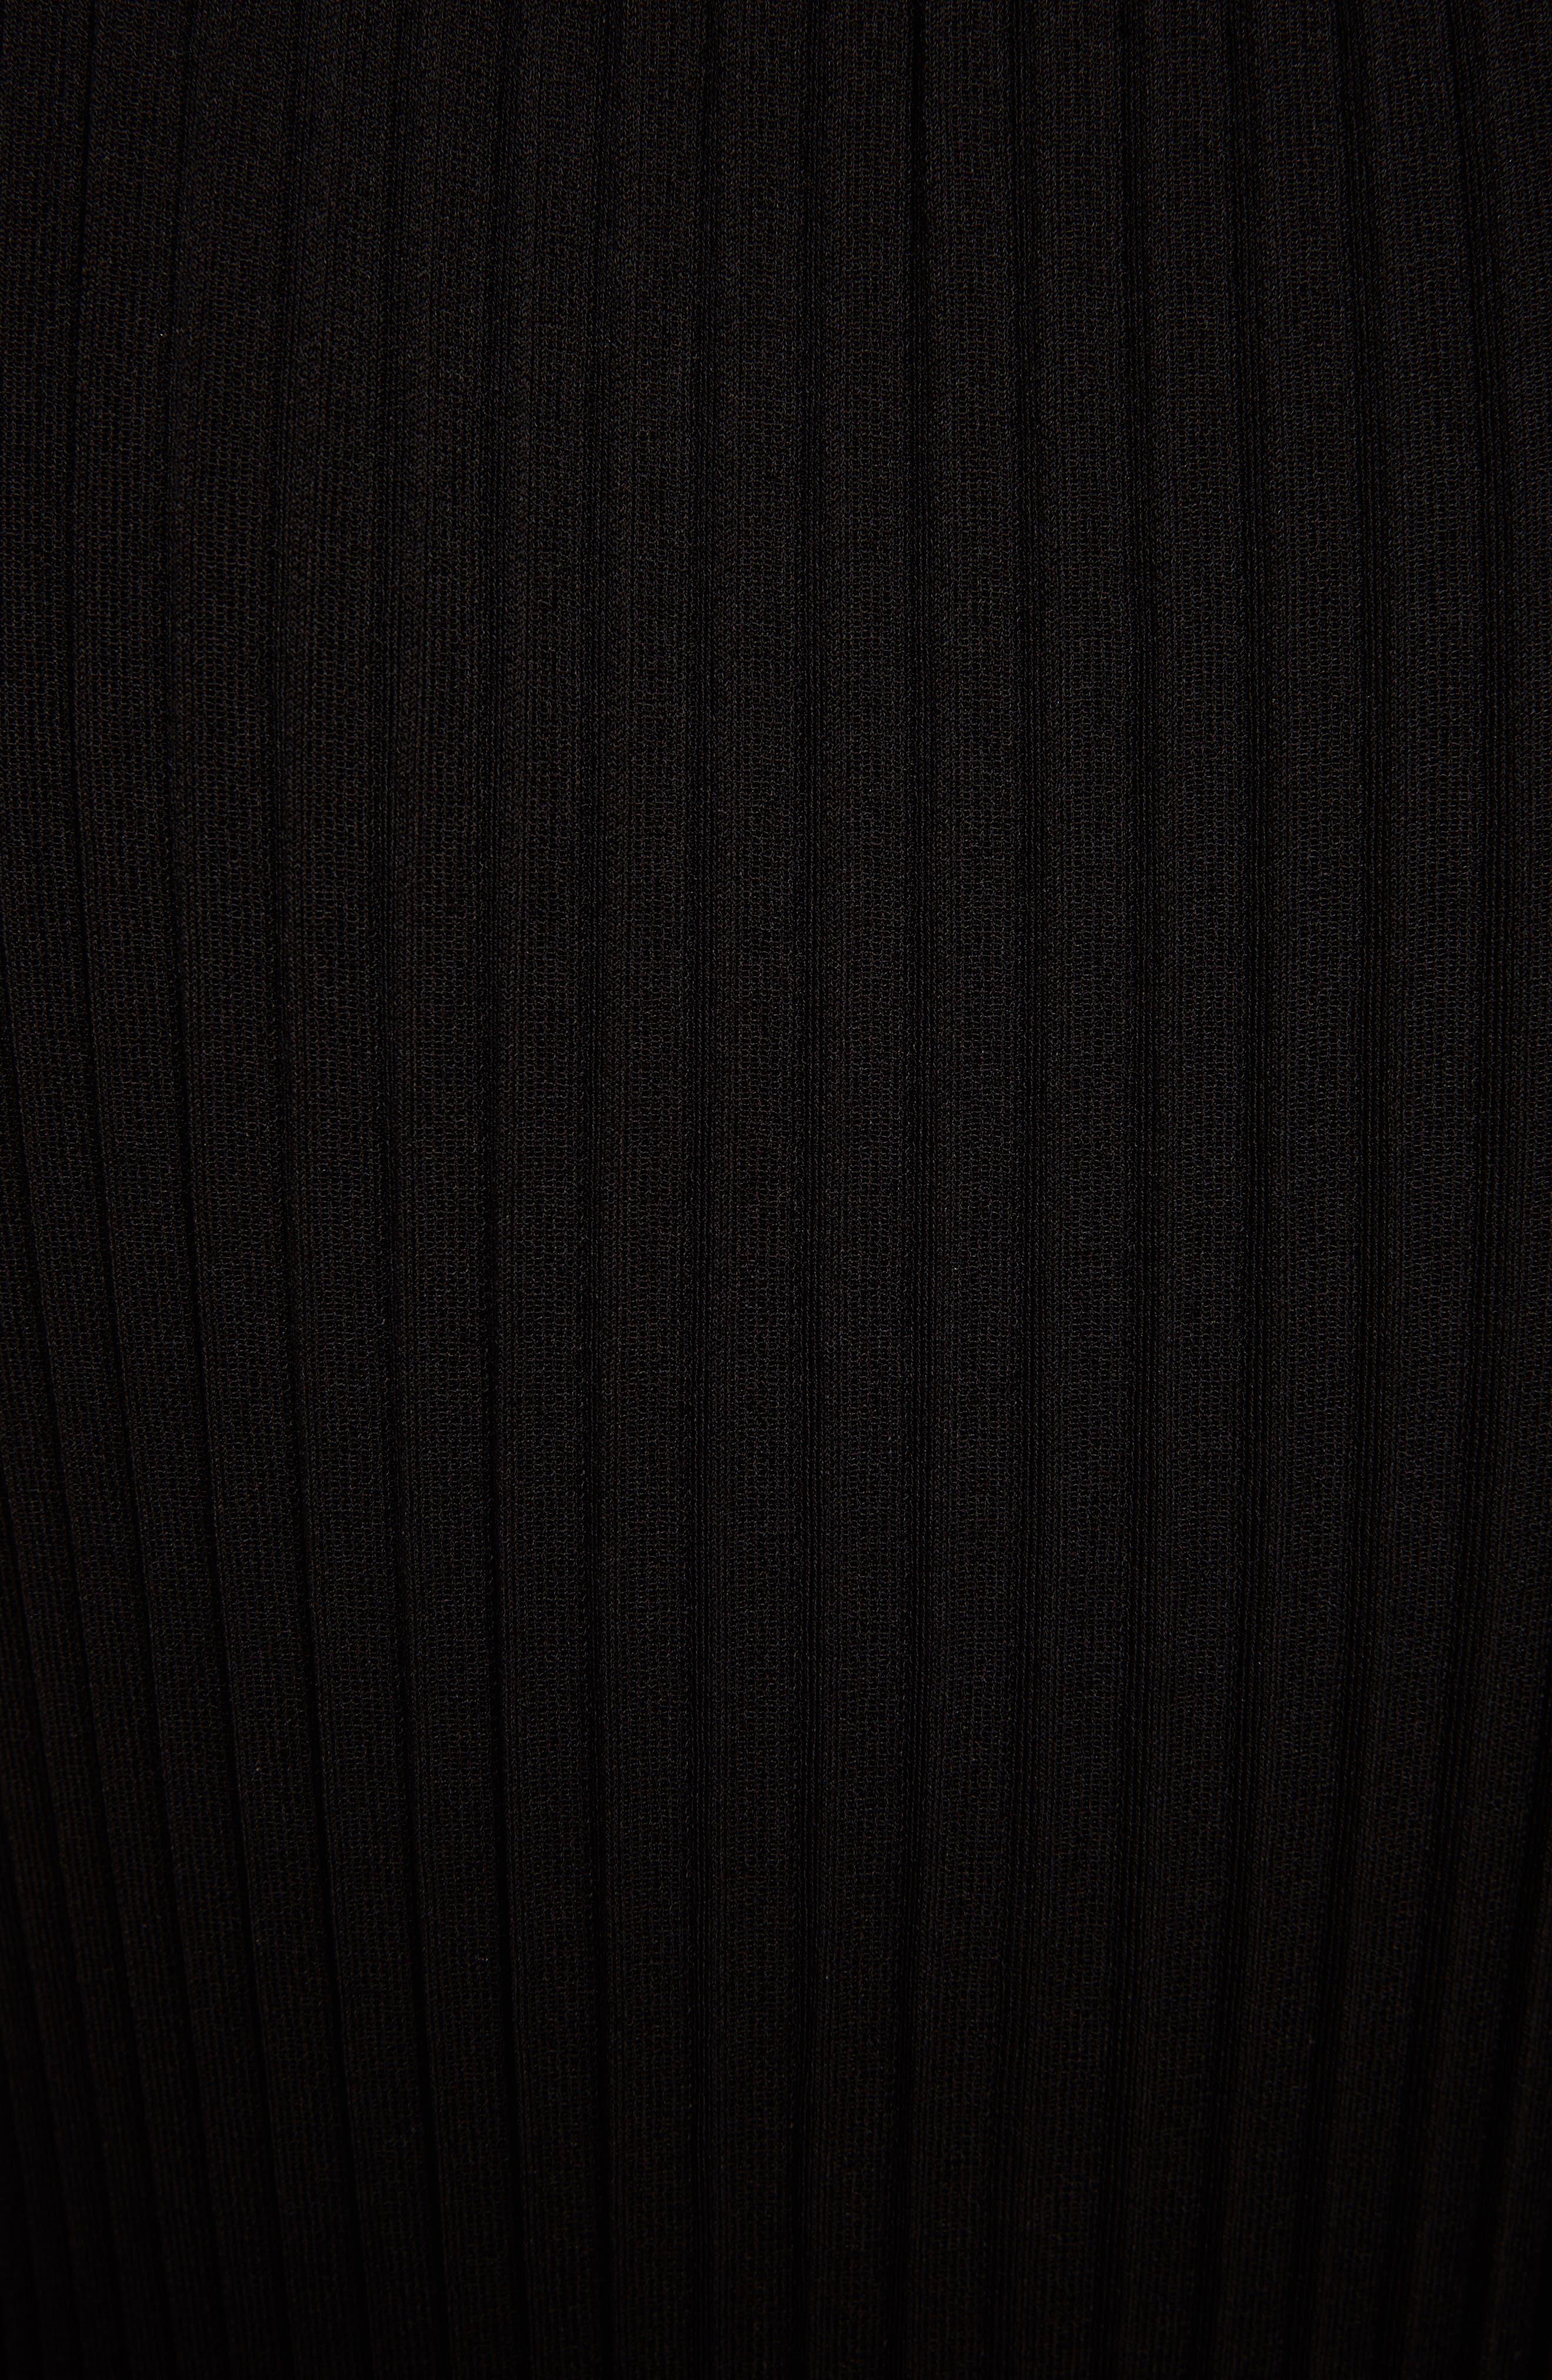 Ribbed Ruffle Hem Dress,                             Alternate thumbnail 5, color,                             001